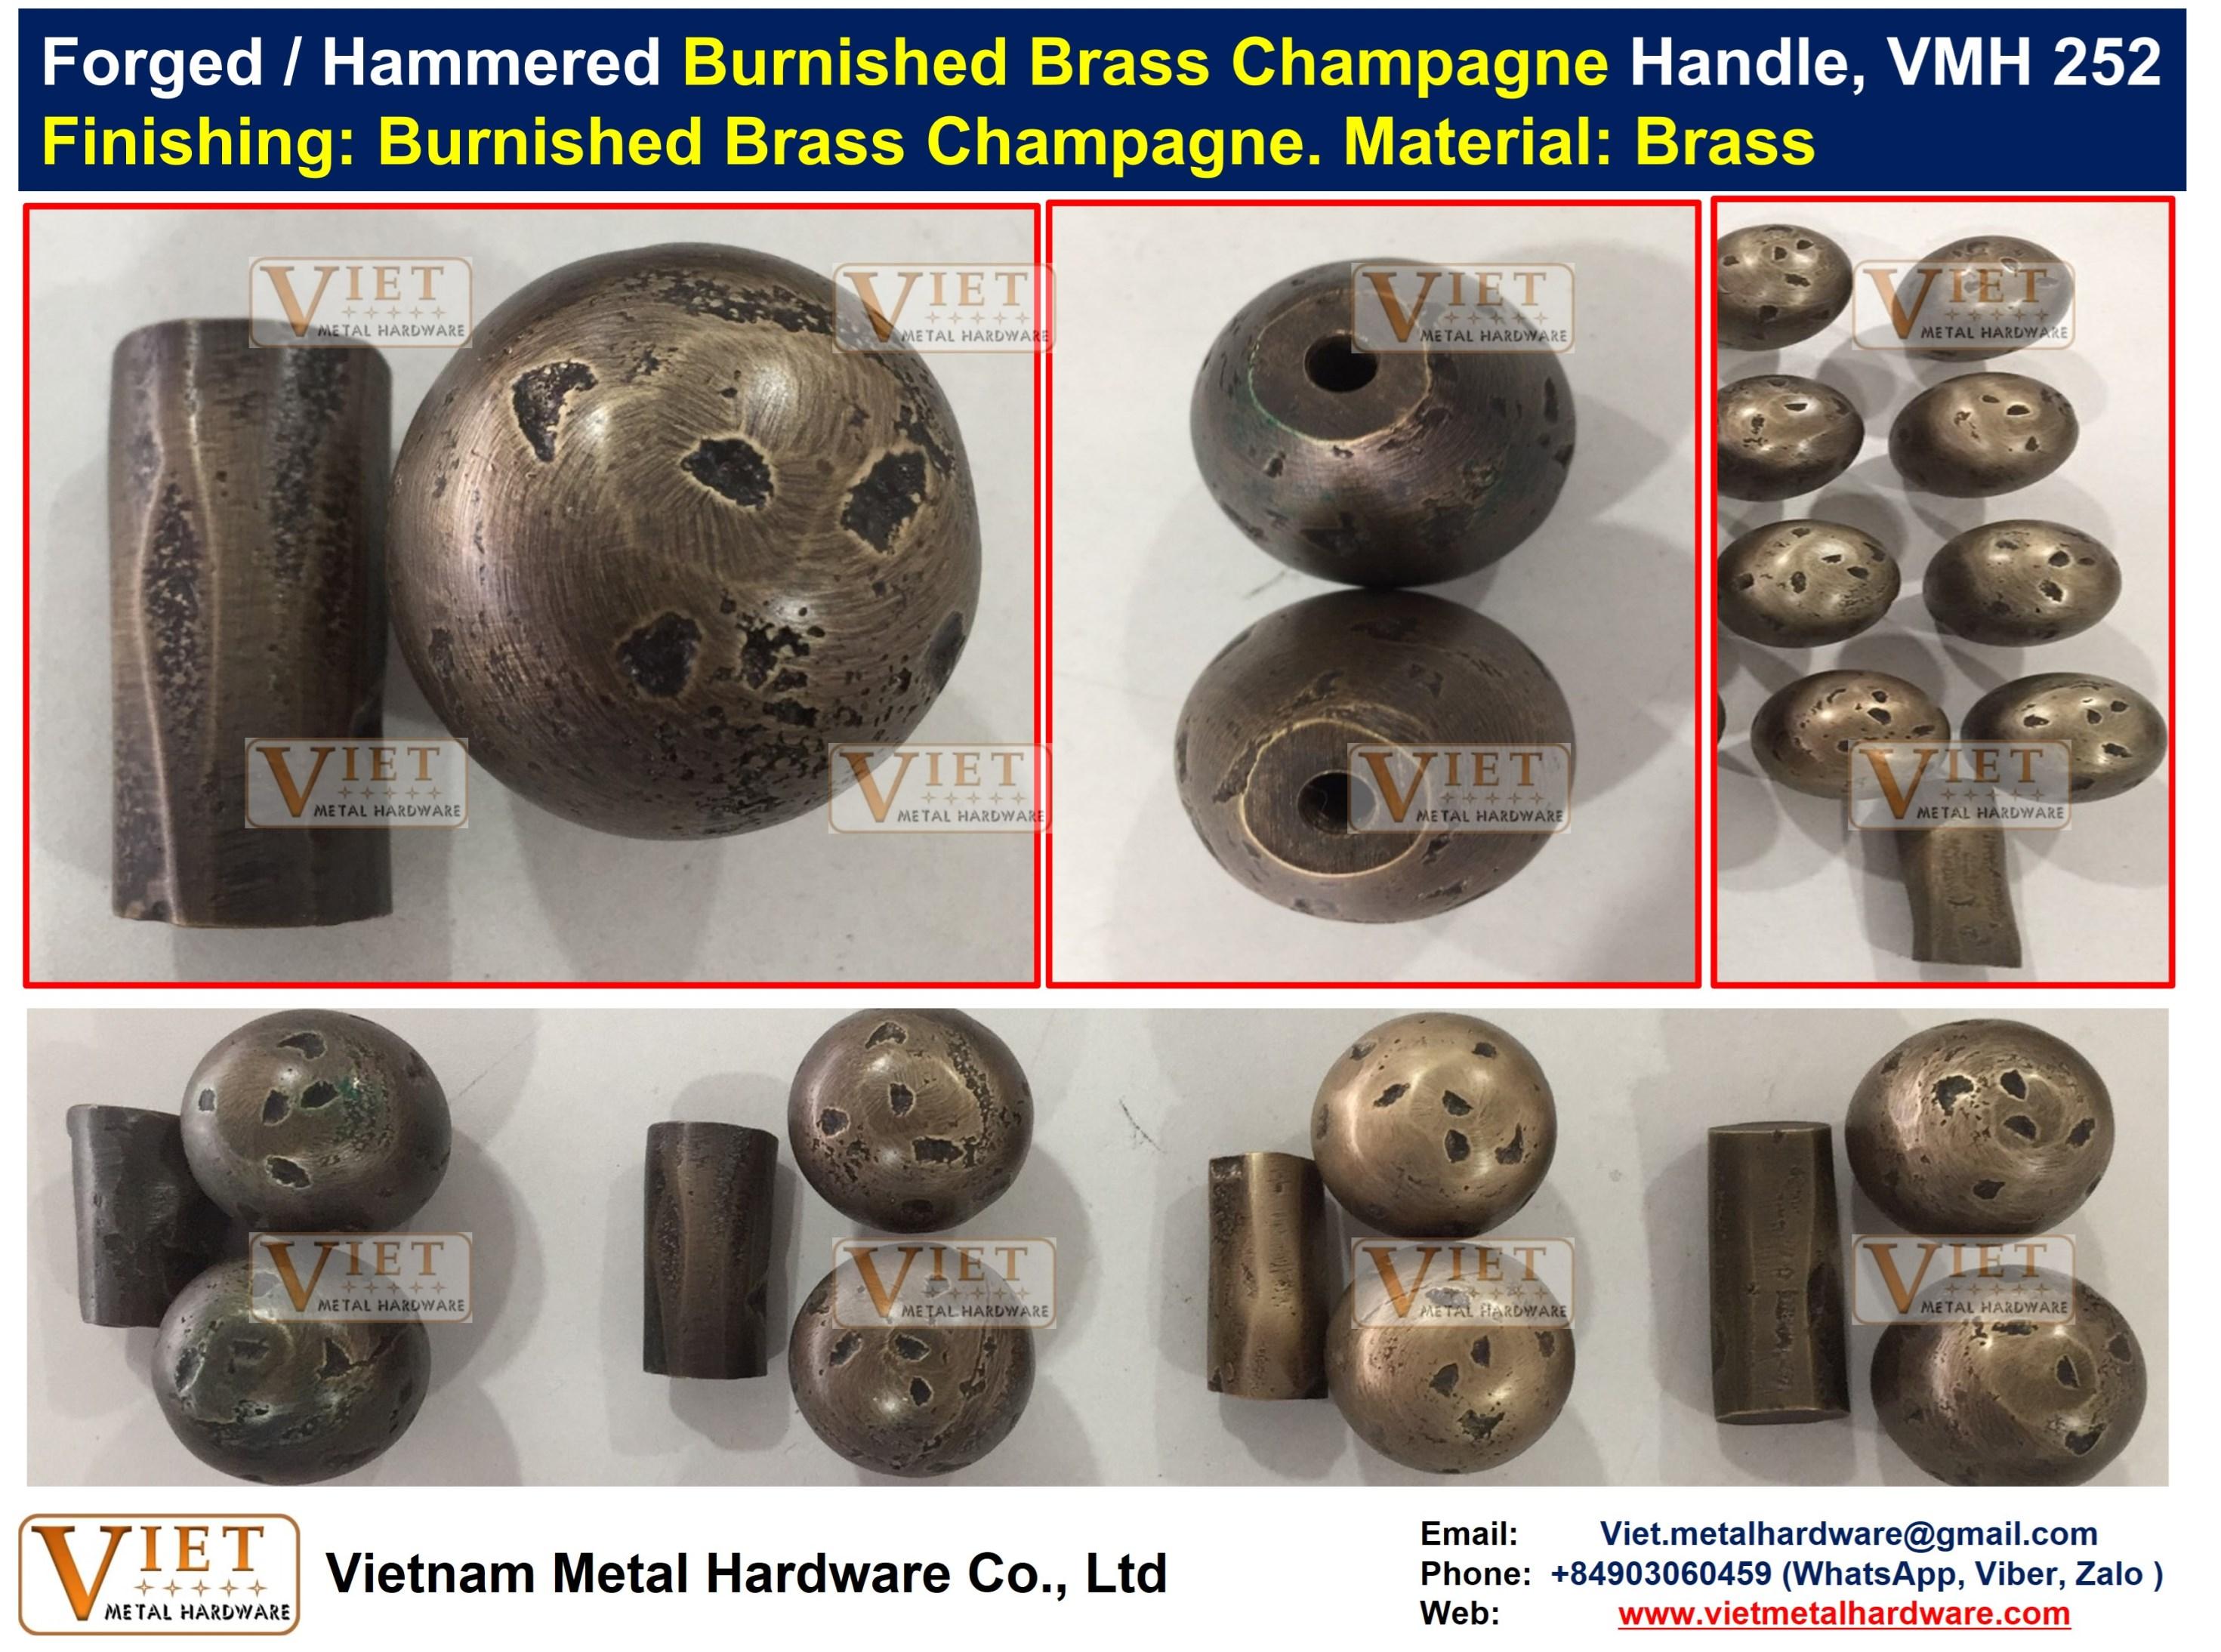 Forged / Hammered Cast Burnished Burnished Brass, Bronze, Dark Bronze, Champagne Ball Handle